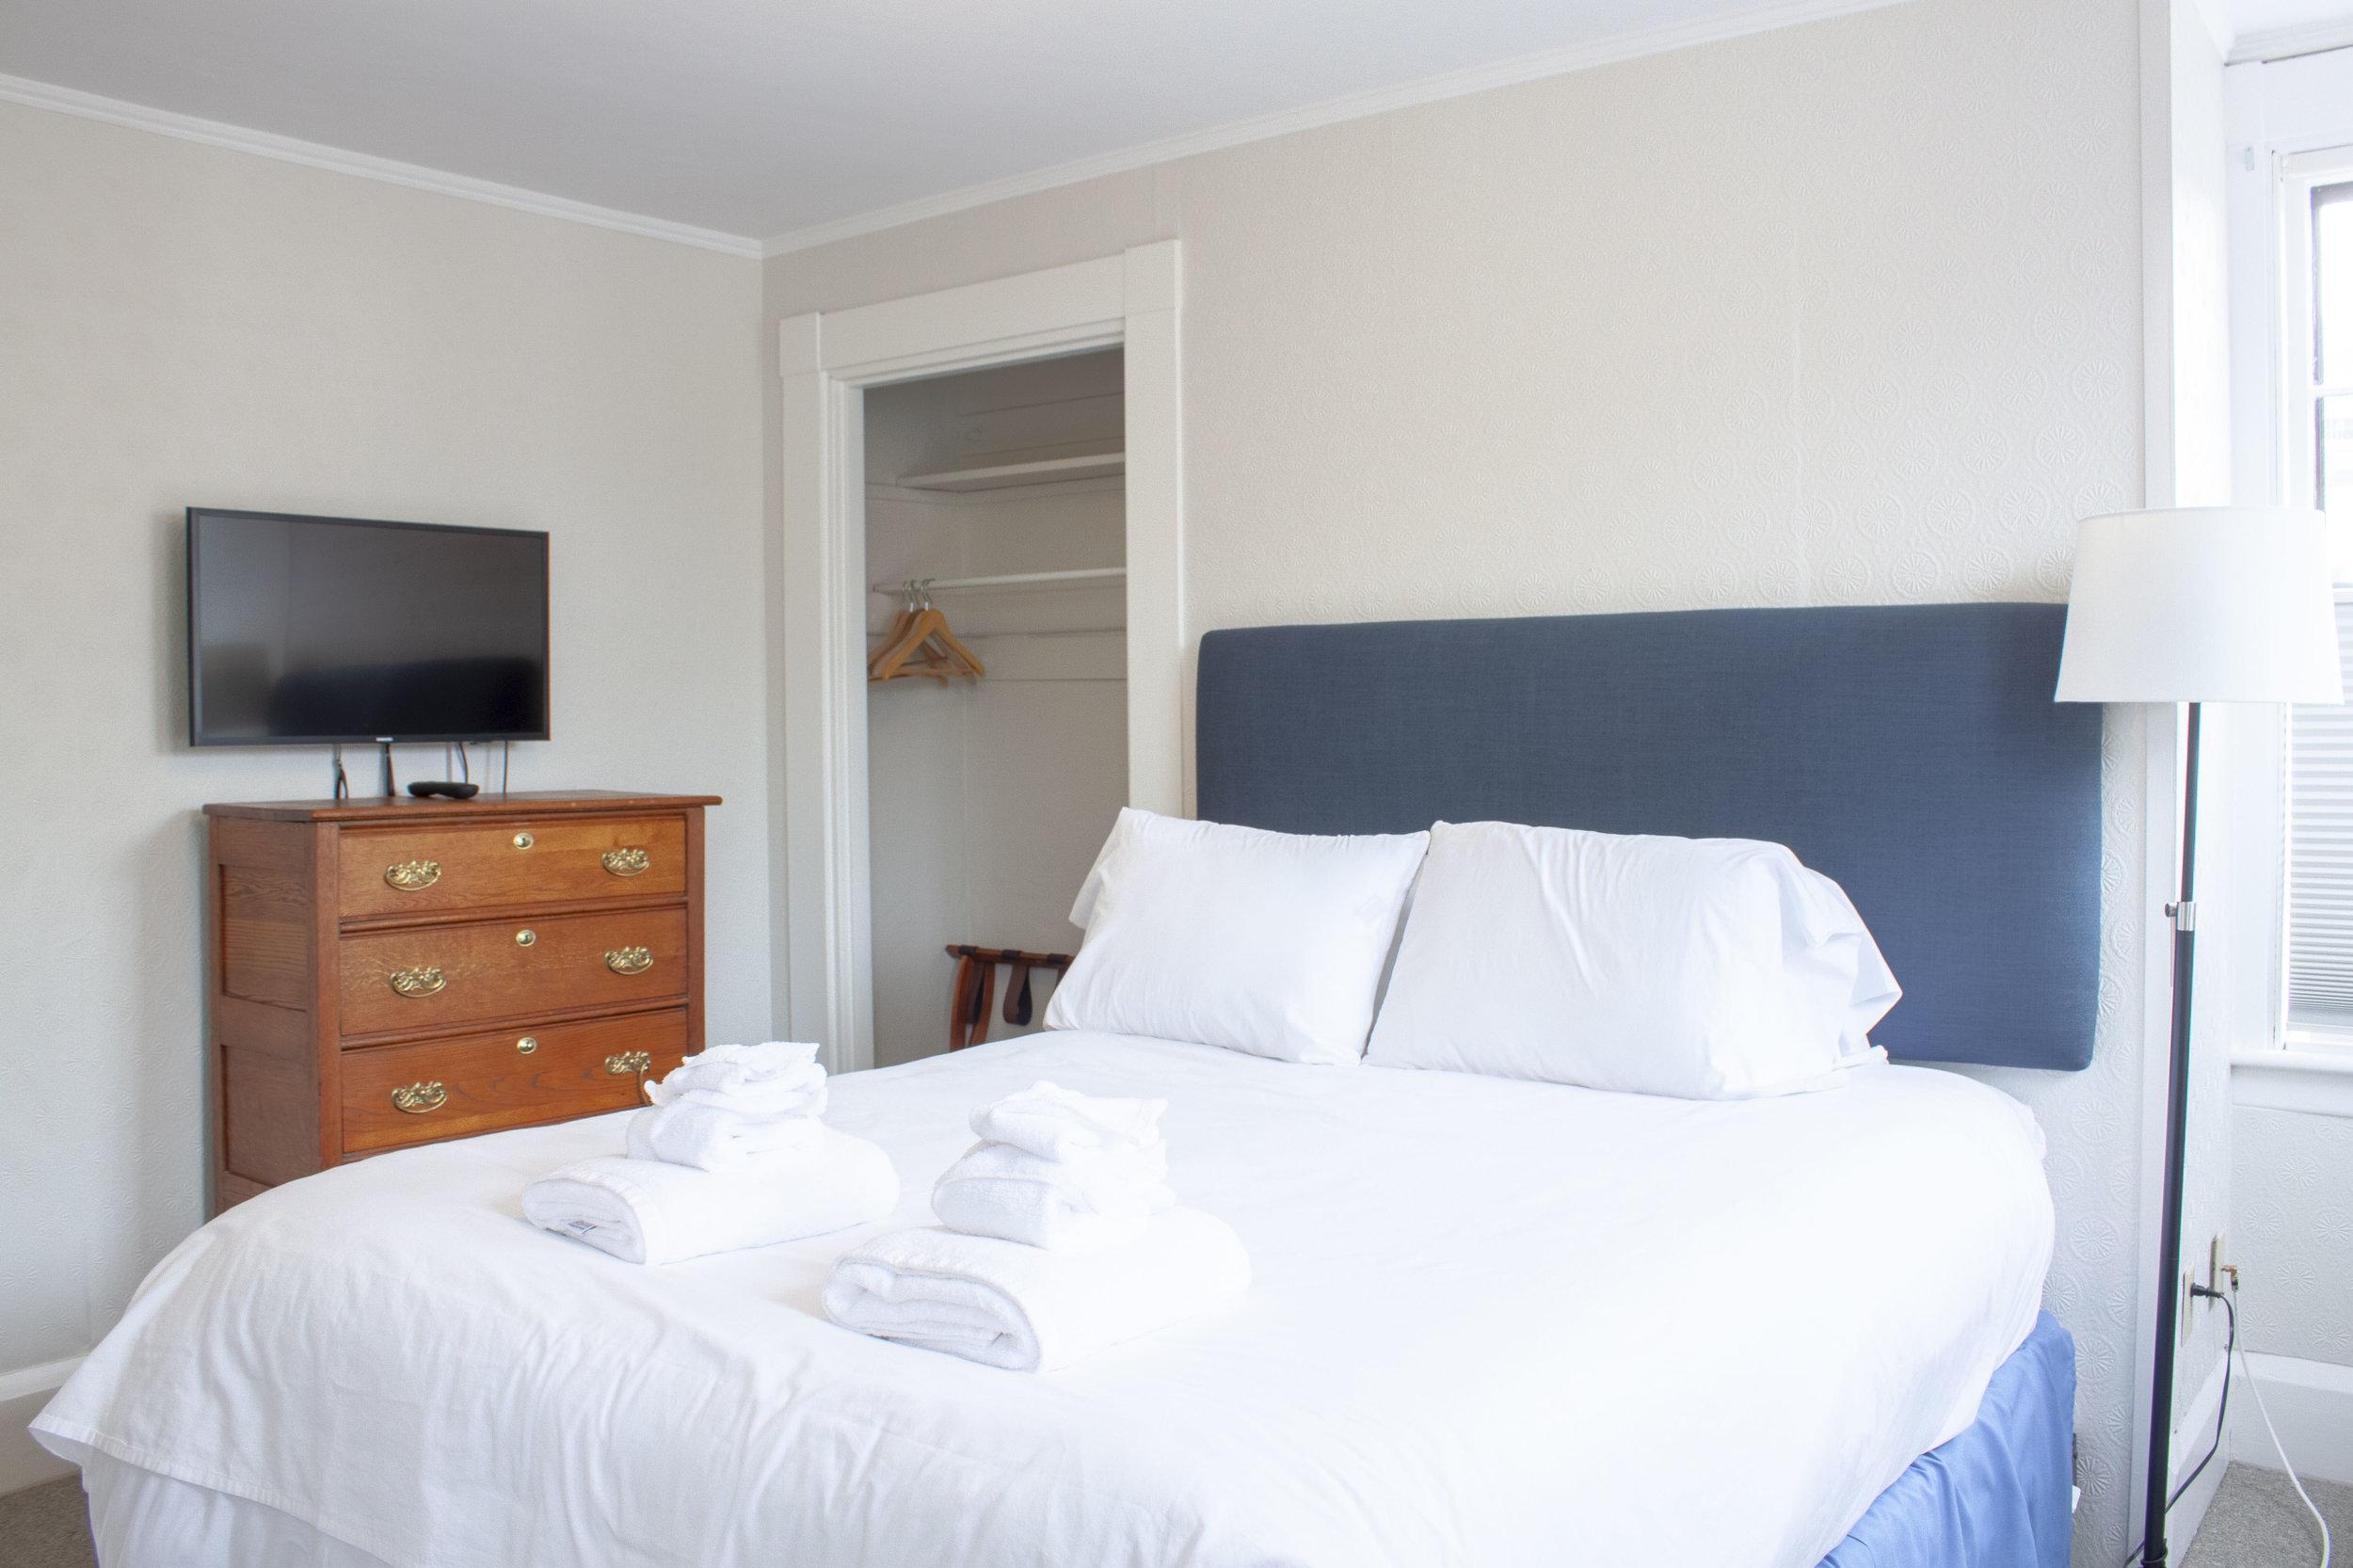 HH_Room4_2.jpg